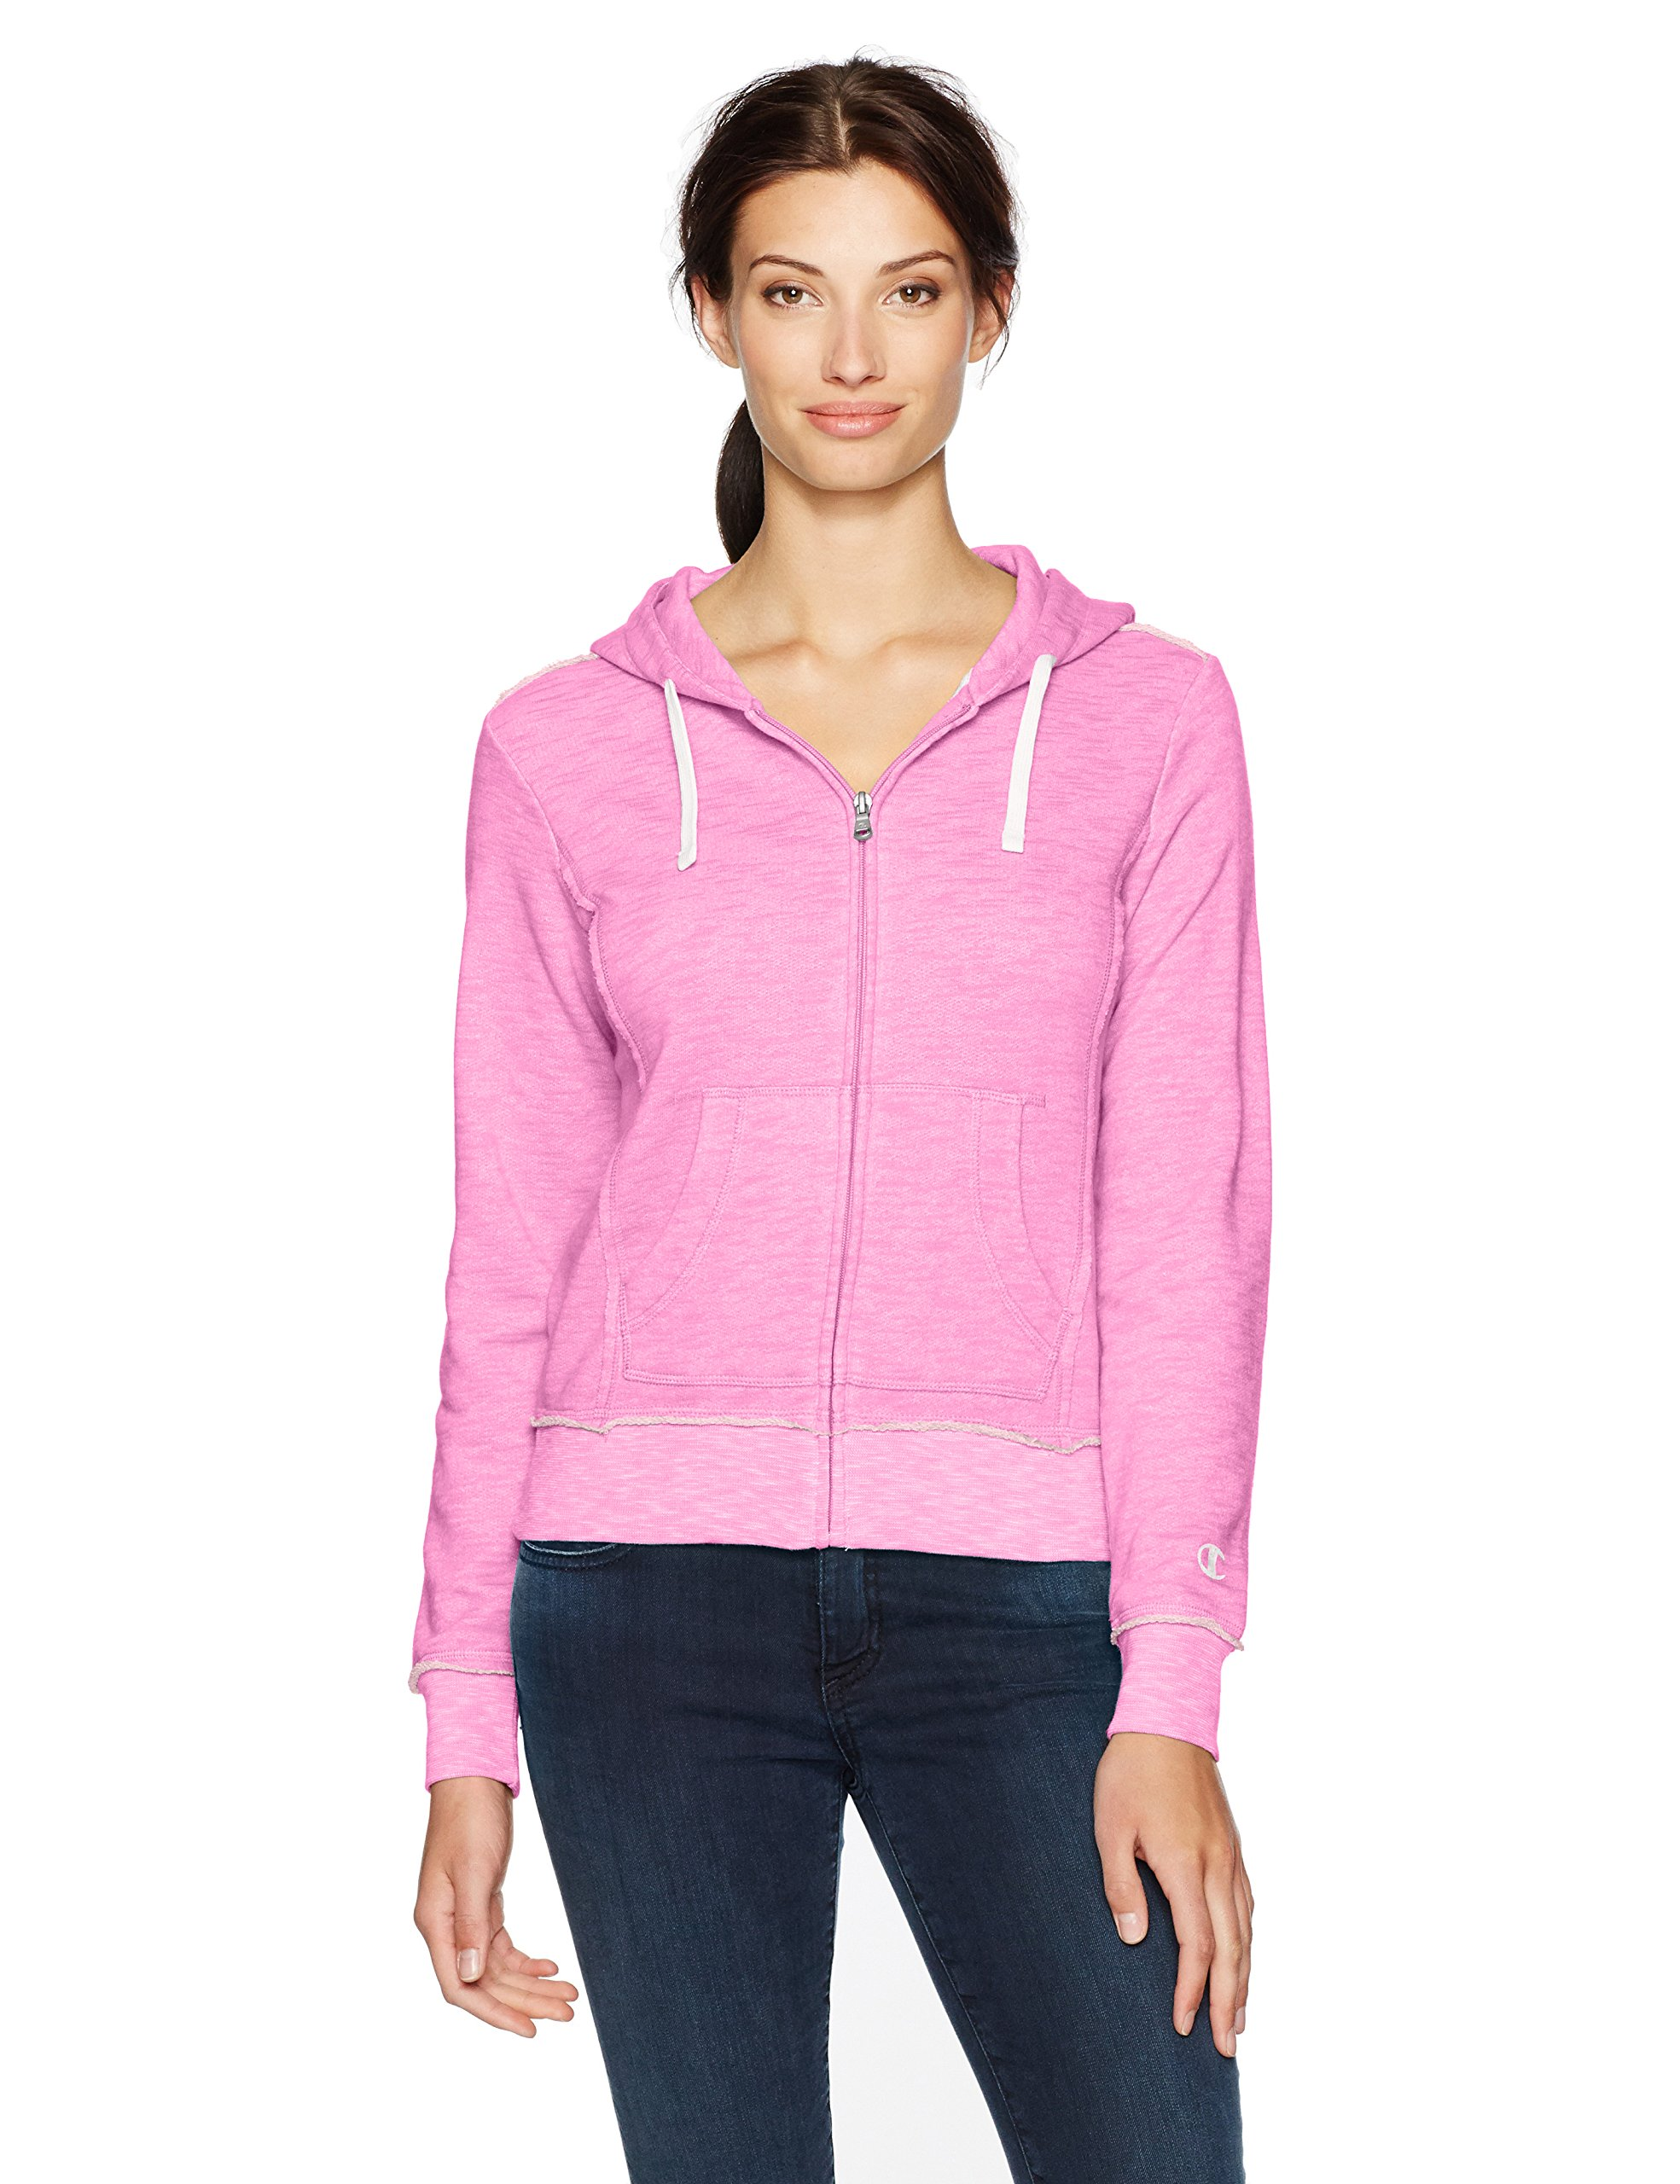 Champion Women's Distressed Full Zip Hoodie (Edition), Pink, M